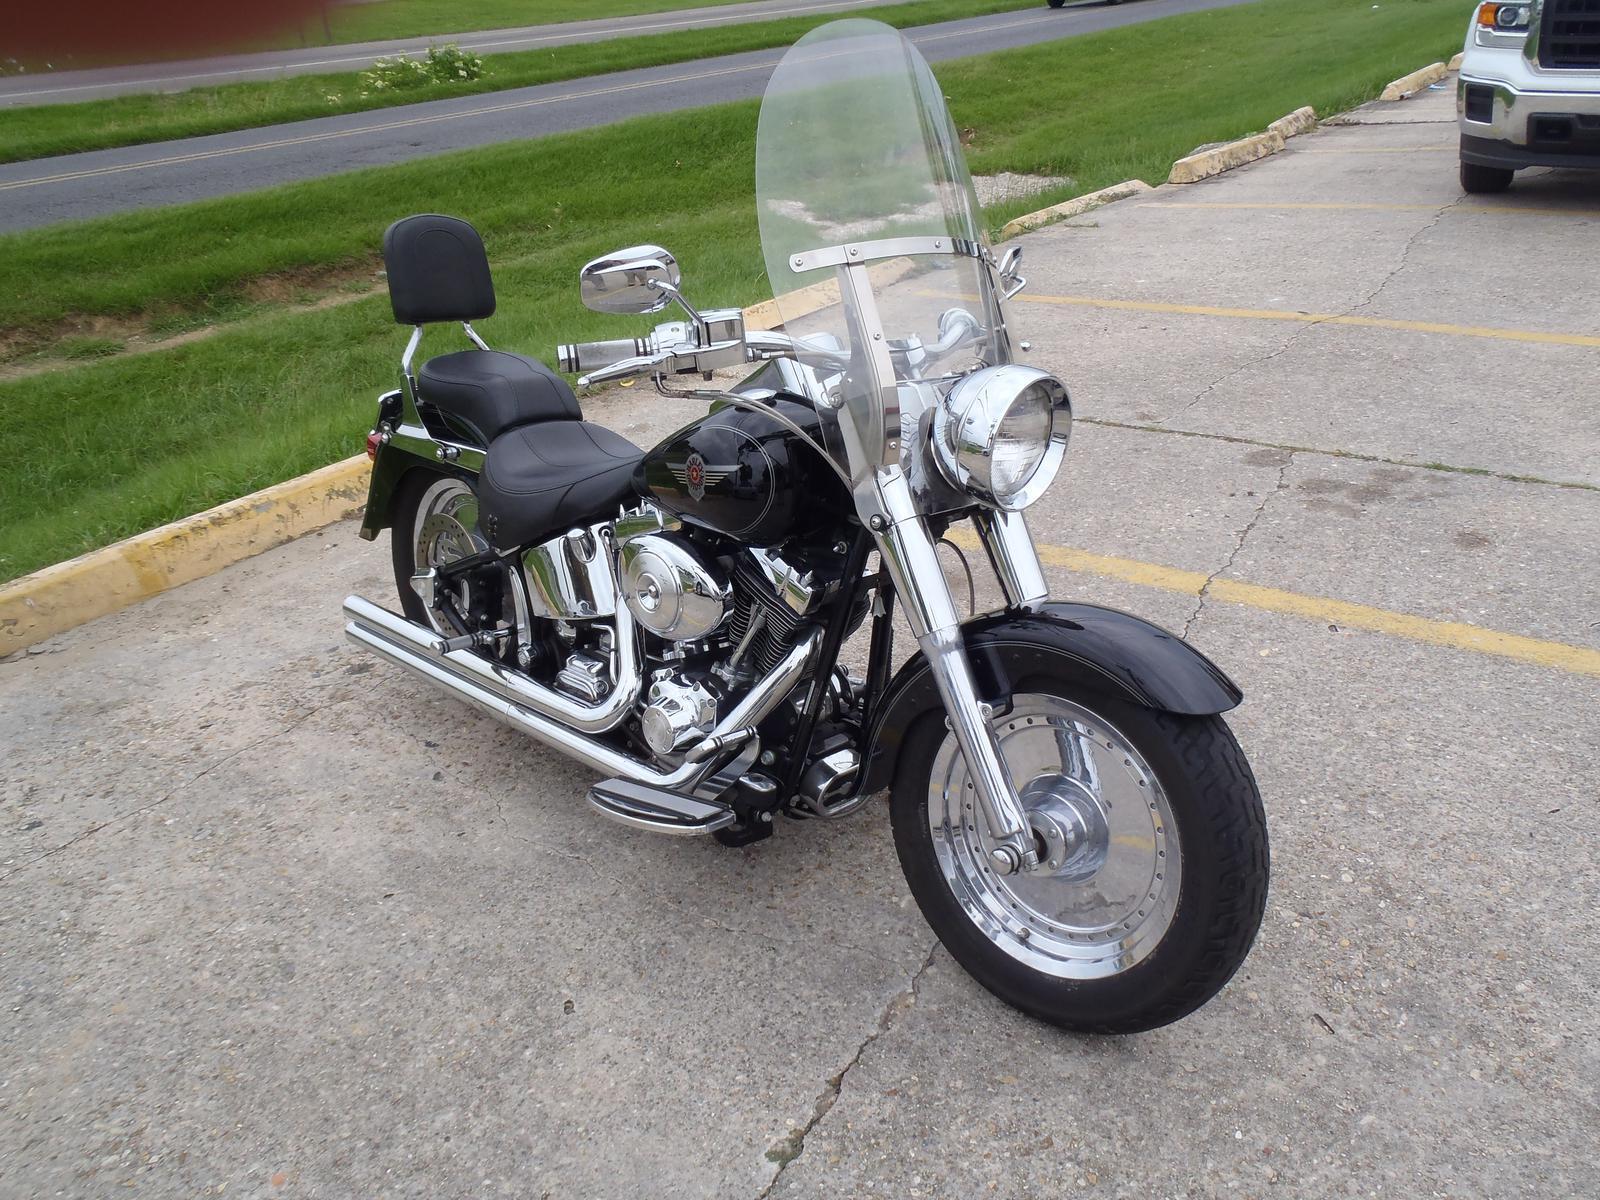 $8,999, 2004 Harley-Davidson Fatboy